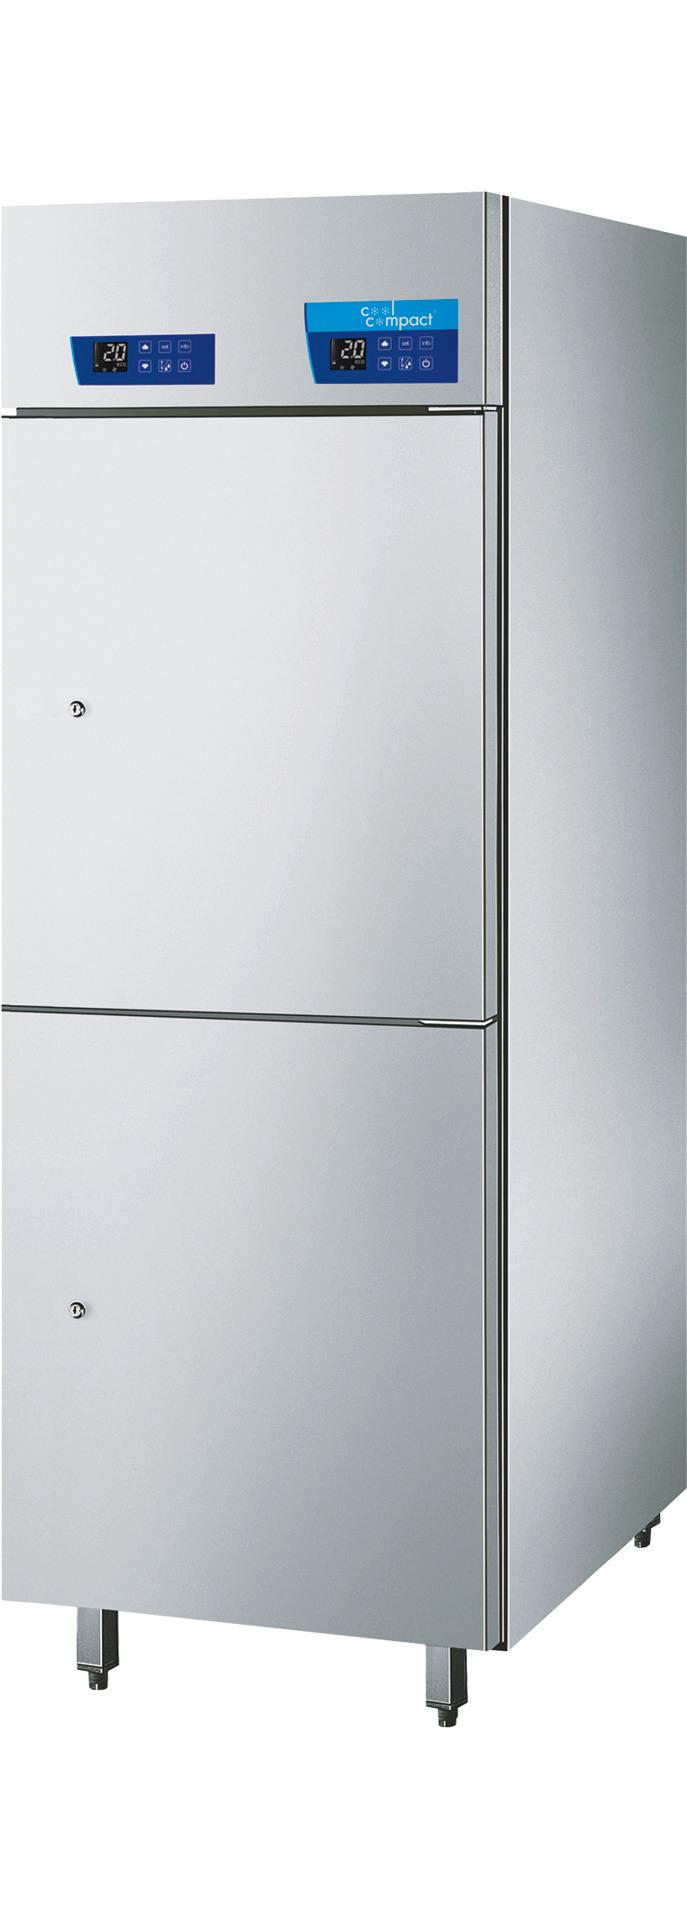 Umluft-Kühlschrank 2-Temperaturen  10 x GN 2/1 + 8 x GN 2/1 /zentralgekühlt